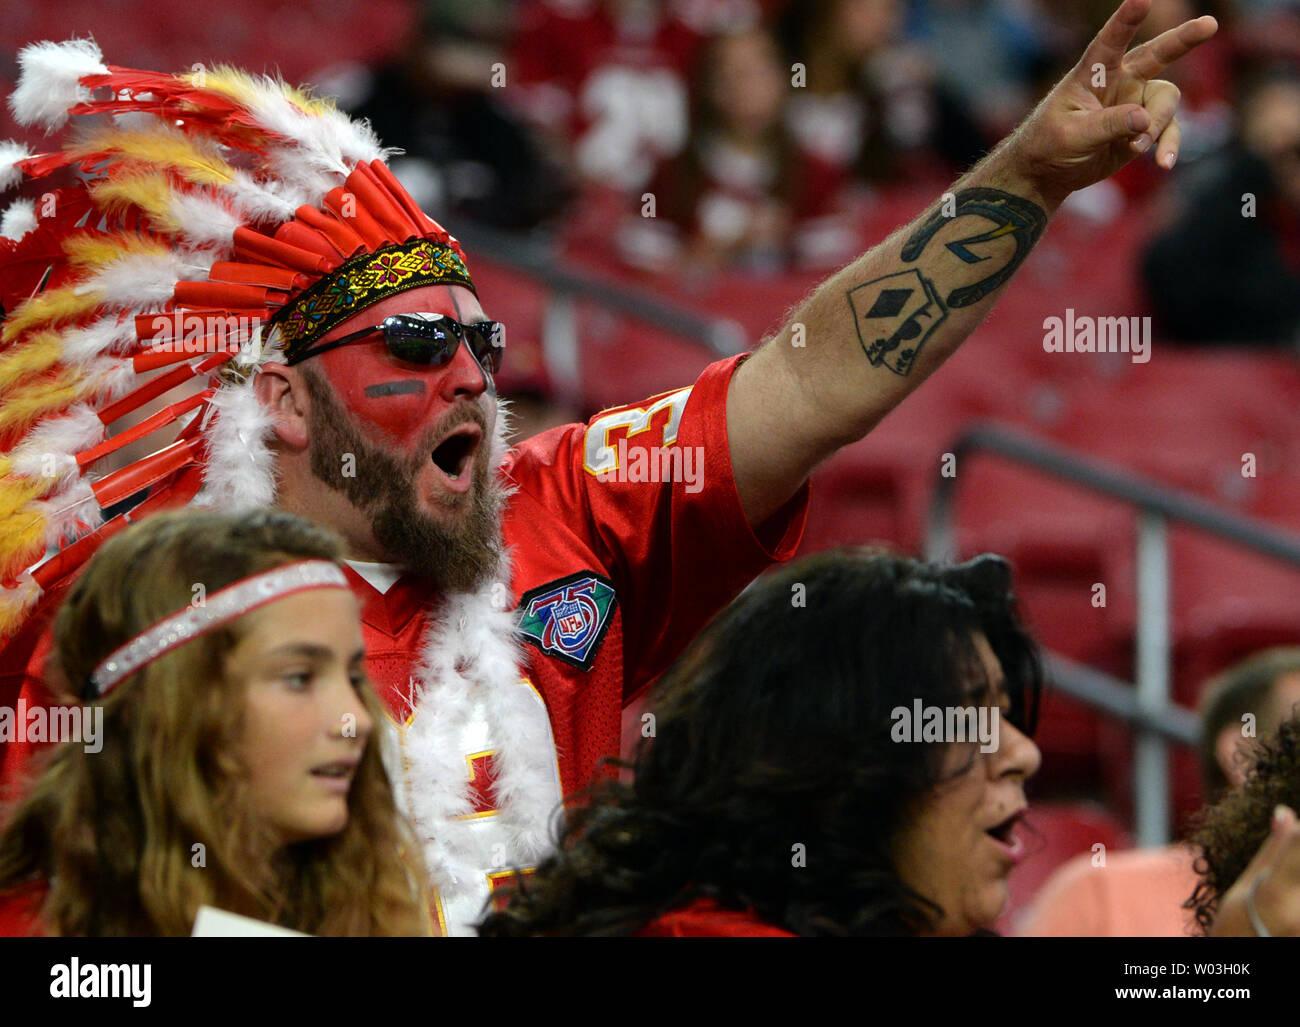 on sale 61c85 a4f84 A Kansas City Chiefs fan wearing a head dress tries to get ...